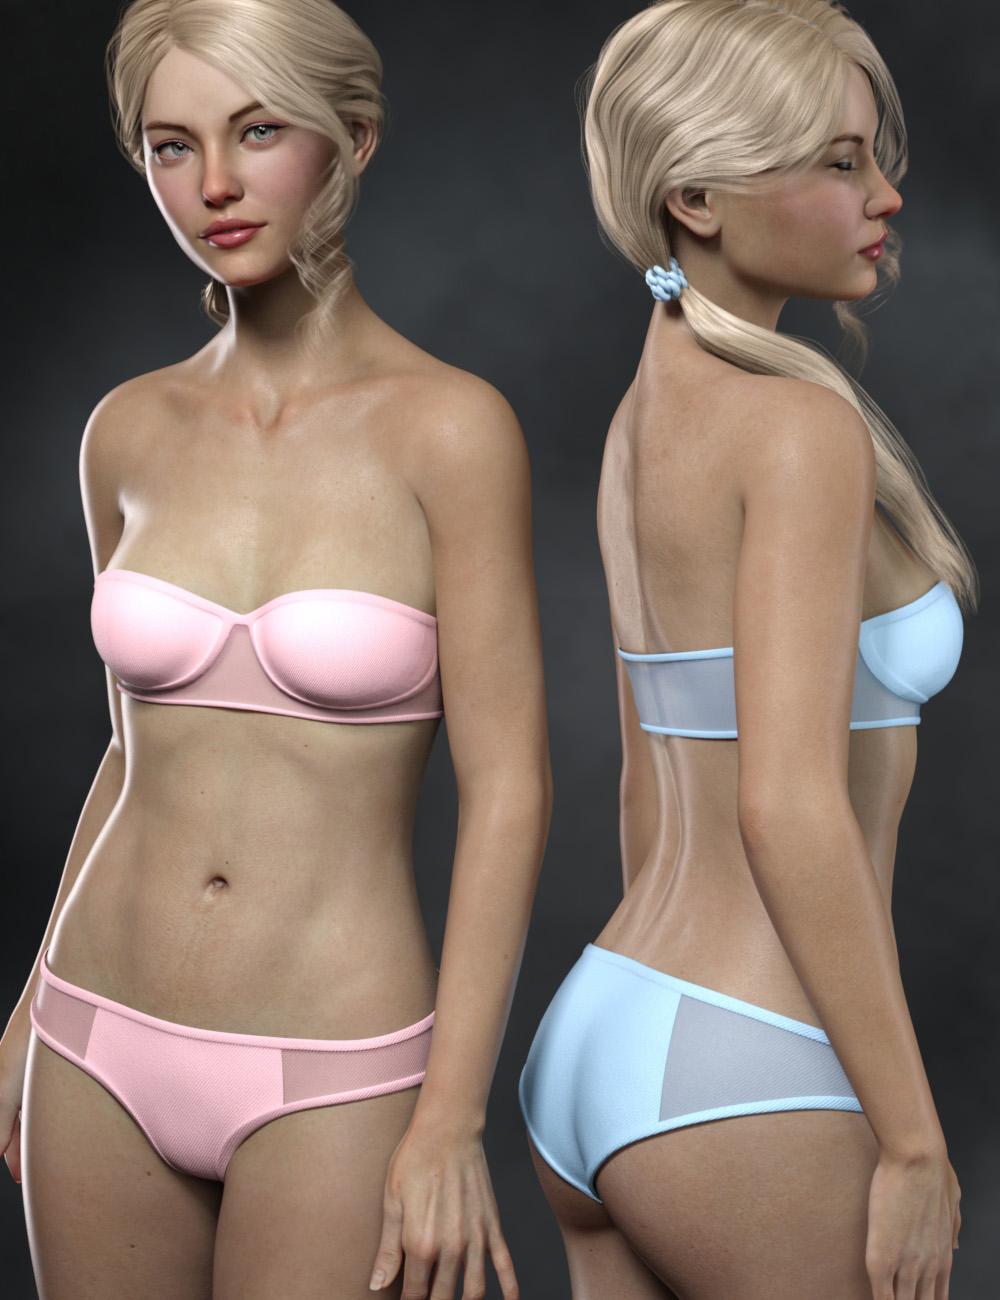 Ciel Bikini for Genesis 8 and 8.1 Females by: Cherubit, 3D Models by Daz 3D